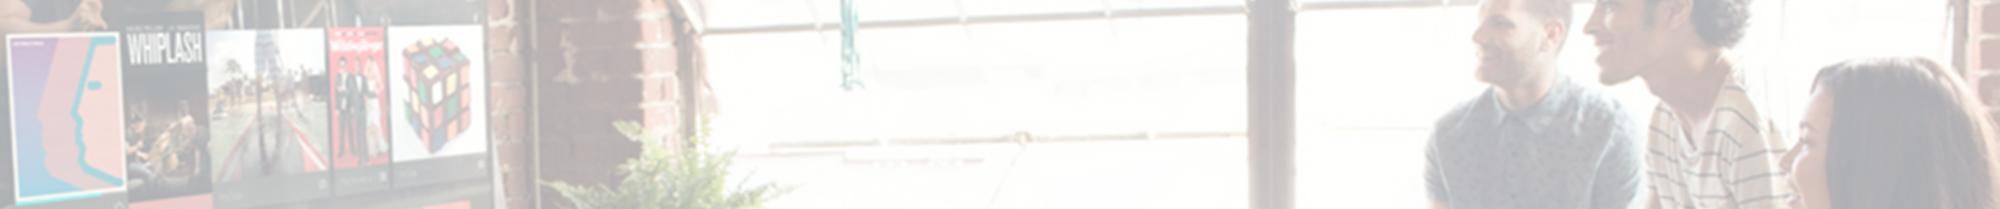 Acessórios TV / Banner Todas as SubCategorias